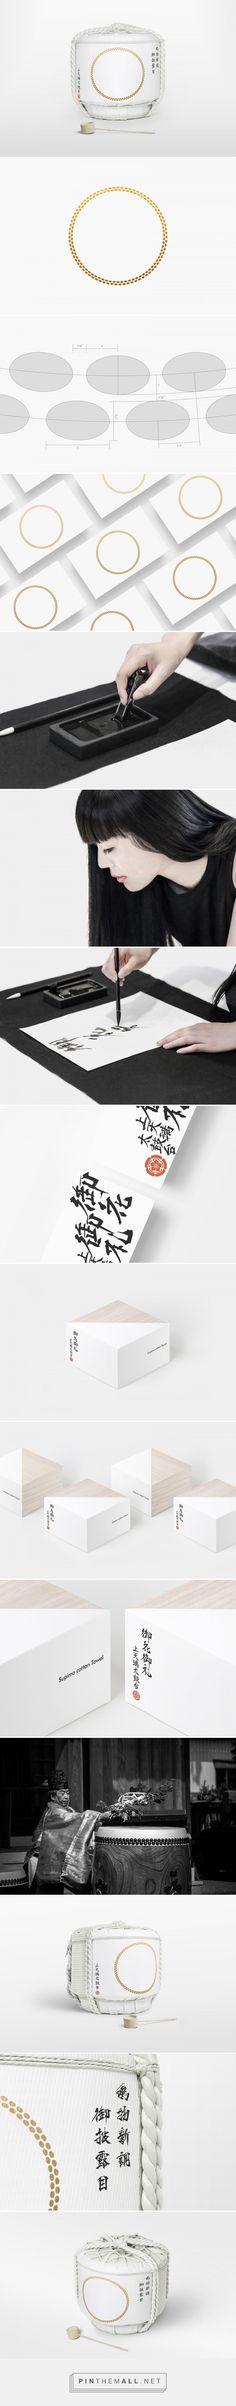 Japan Shikoku Traditional Autumn Festival packaging design by Yuta Takahashi - http://www.packagingoftheworld.com/2016/10/shikoku-traditional-autumn-festival.html